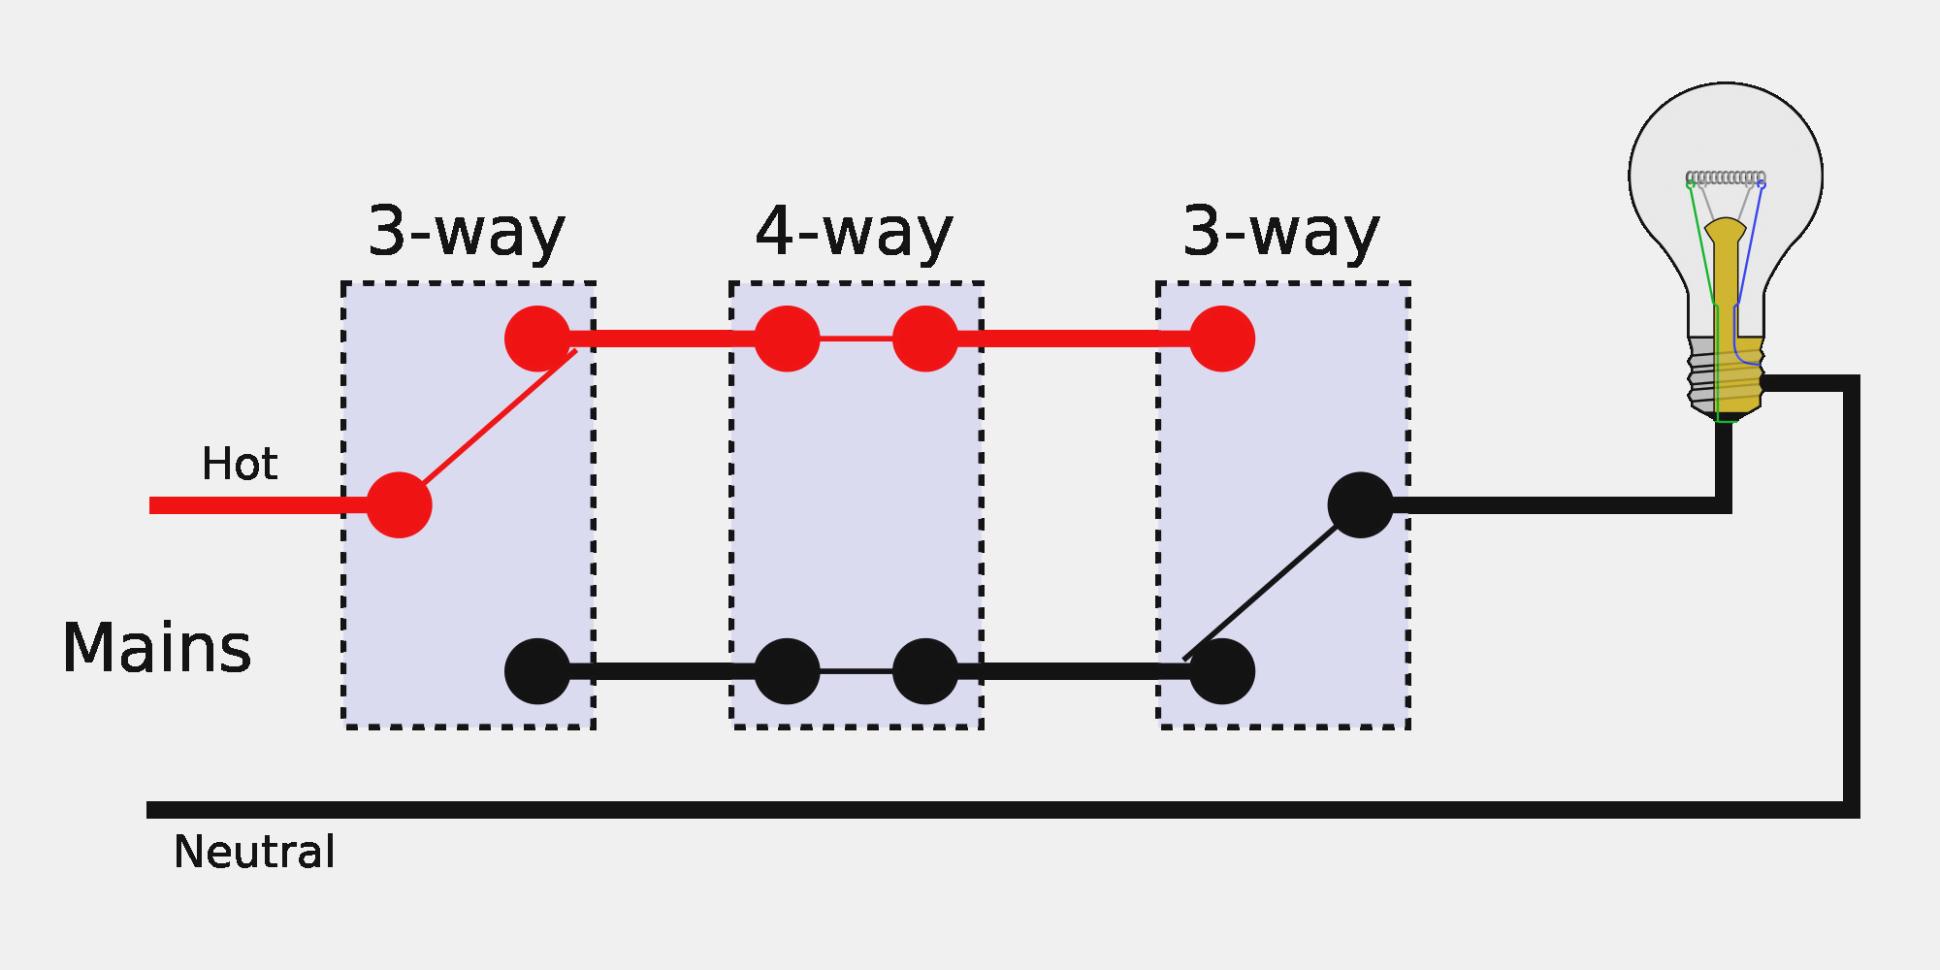 hight resolution of 3 way light switch wiring diagram pdf wiring diagram 4 way switch wiring diagram